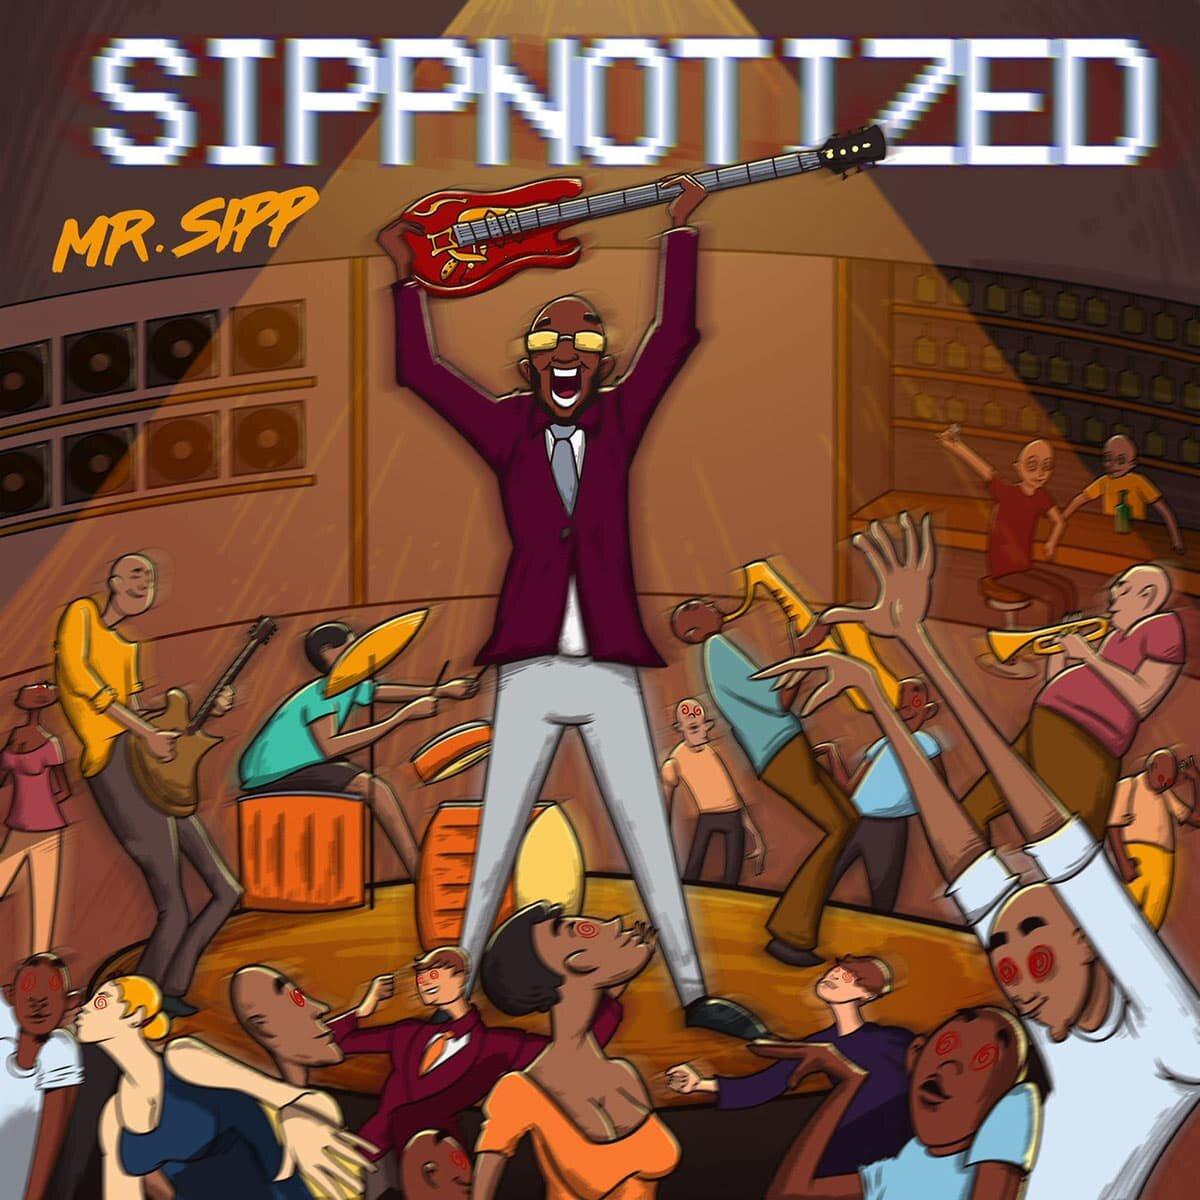 Mr. Sipp - Sippnotized